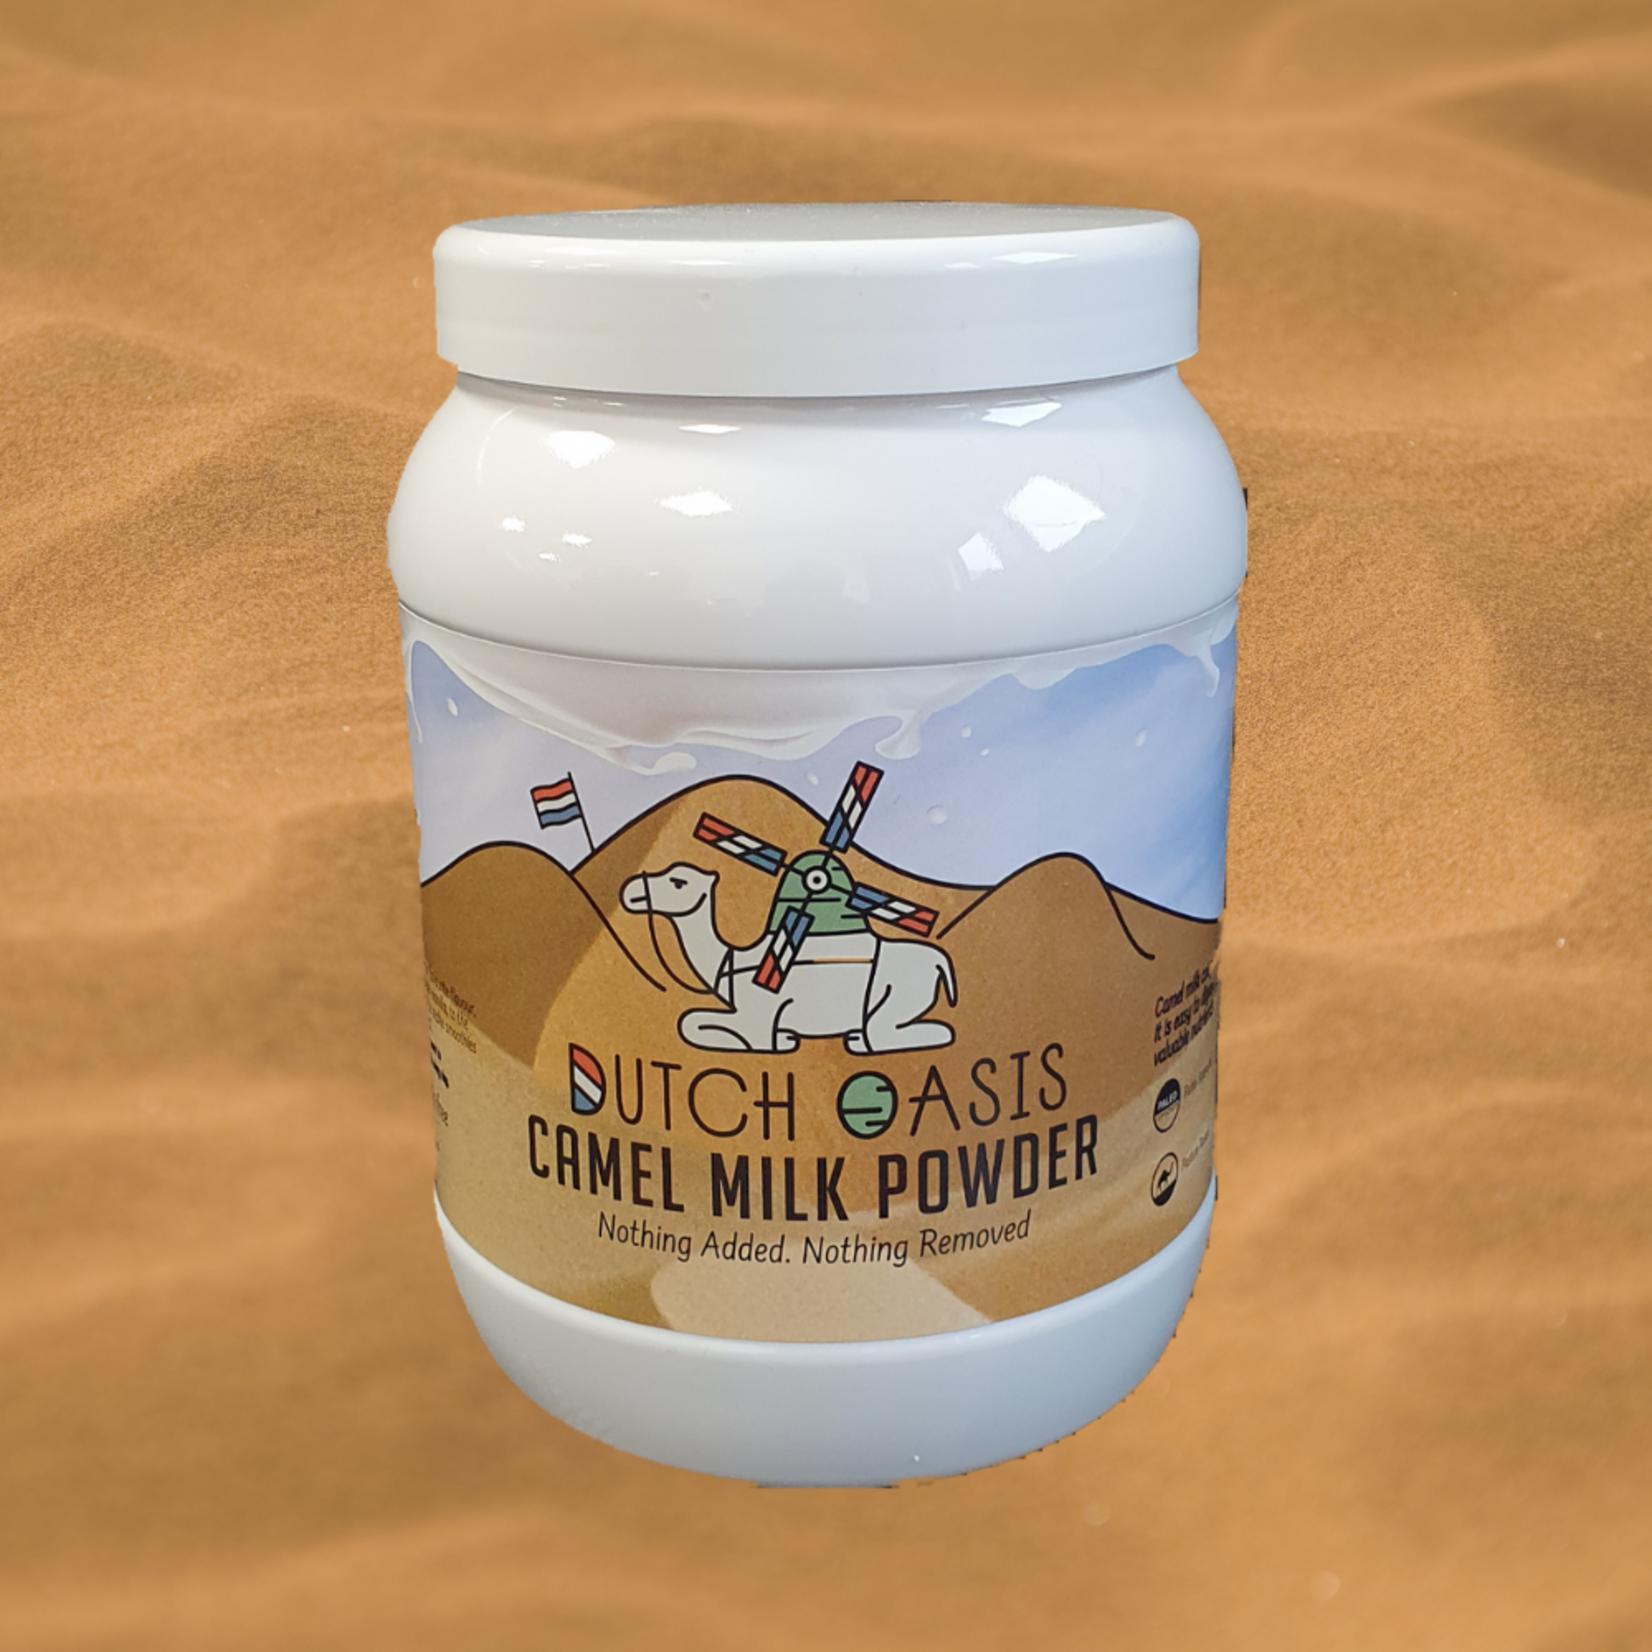 420gr Camel milkpowder in plastic jar